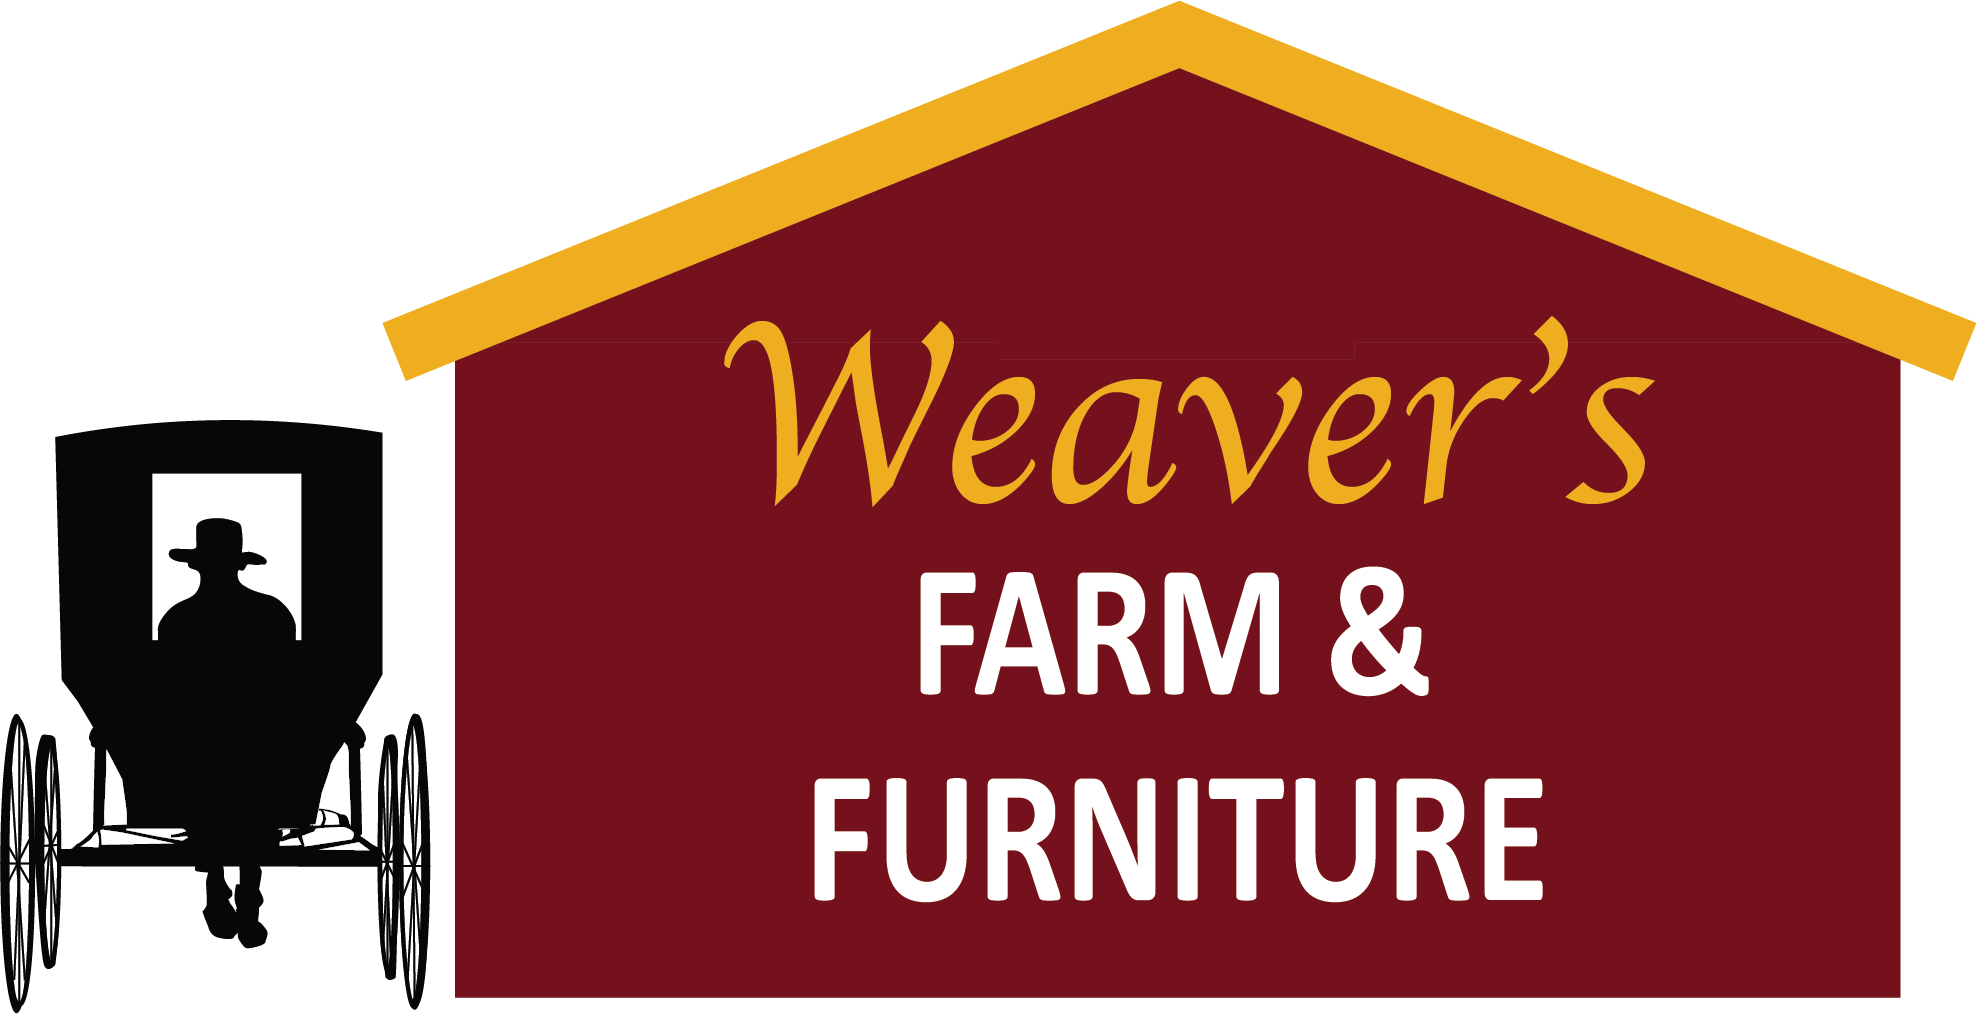 weaversMaroon601